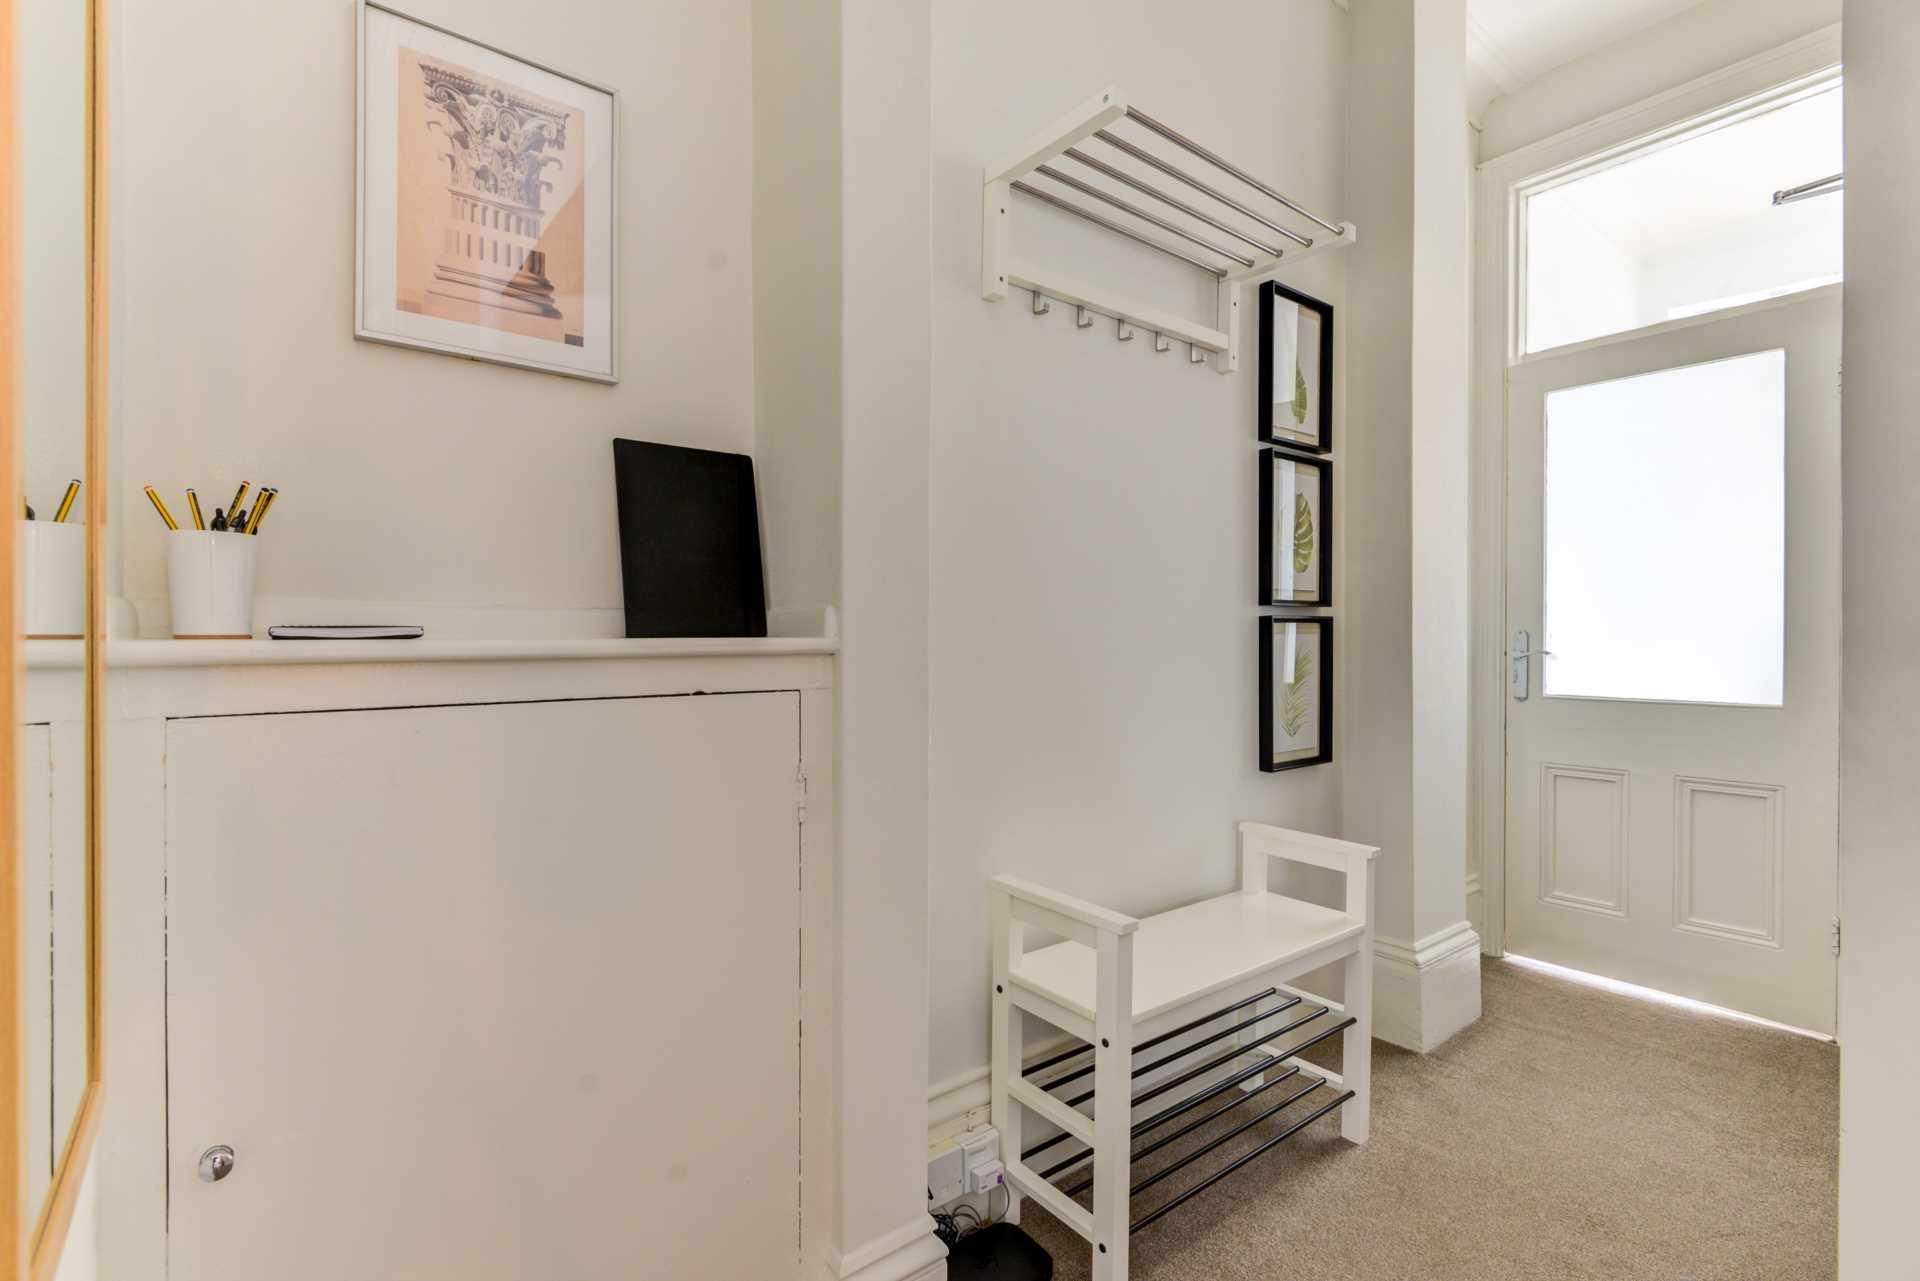 St Aubyns Studio, Image 6